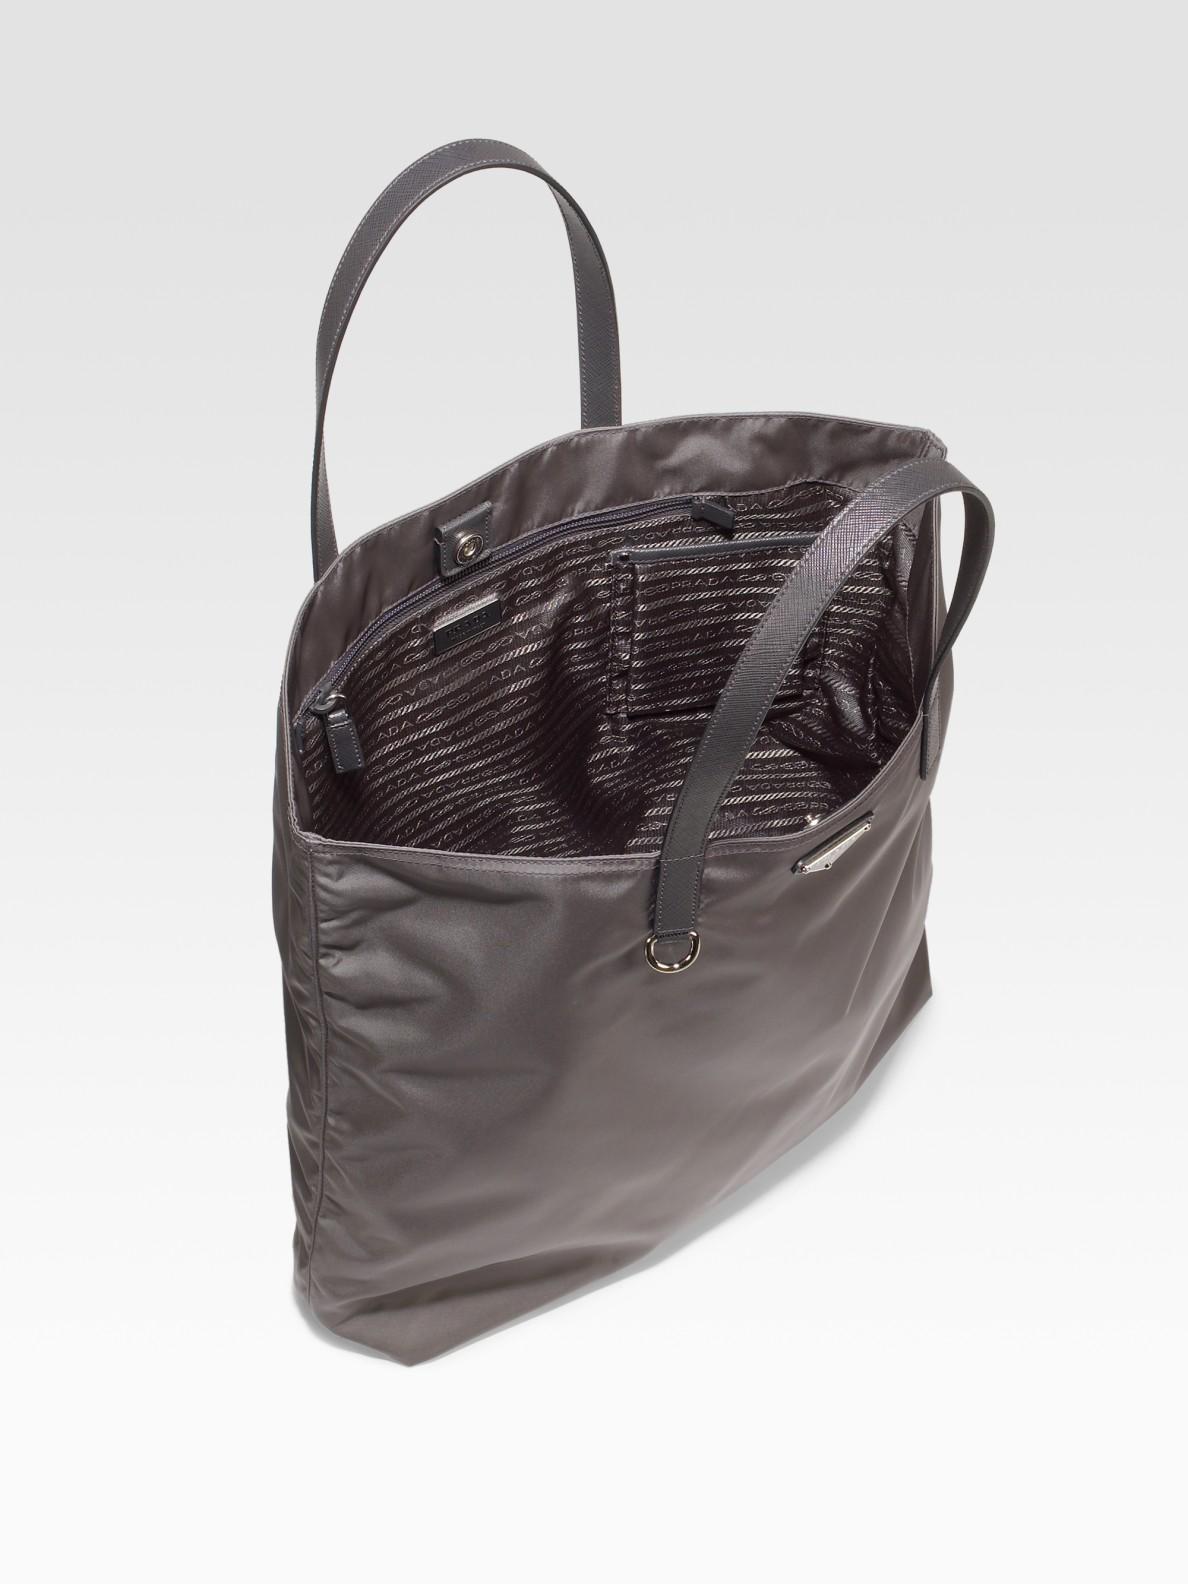 prada handbags leather - prada-grey-vela-nylon-tote-gray-product-2-455245-331940483.jpeg